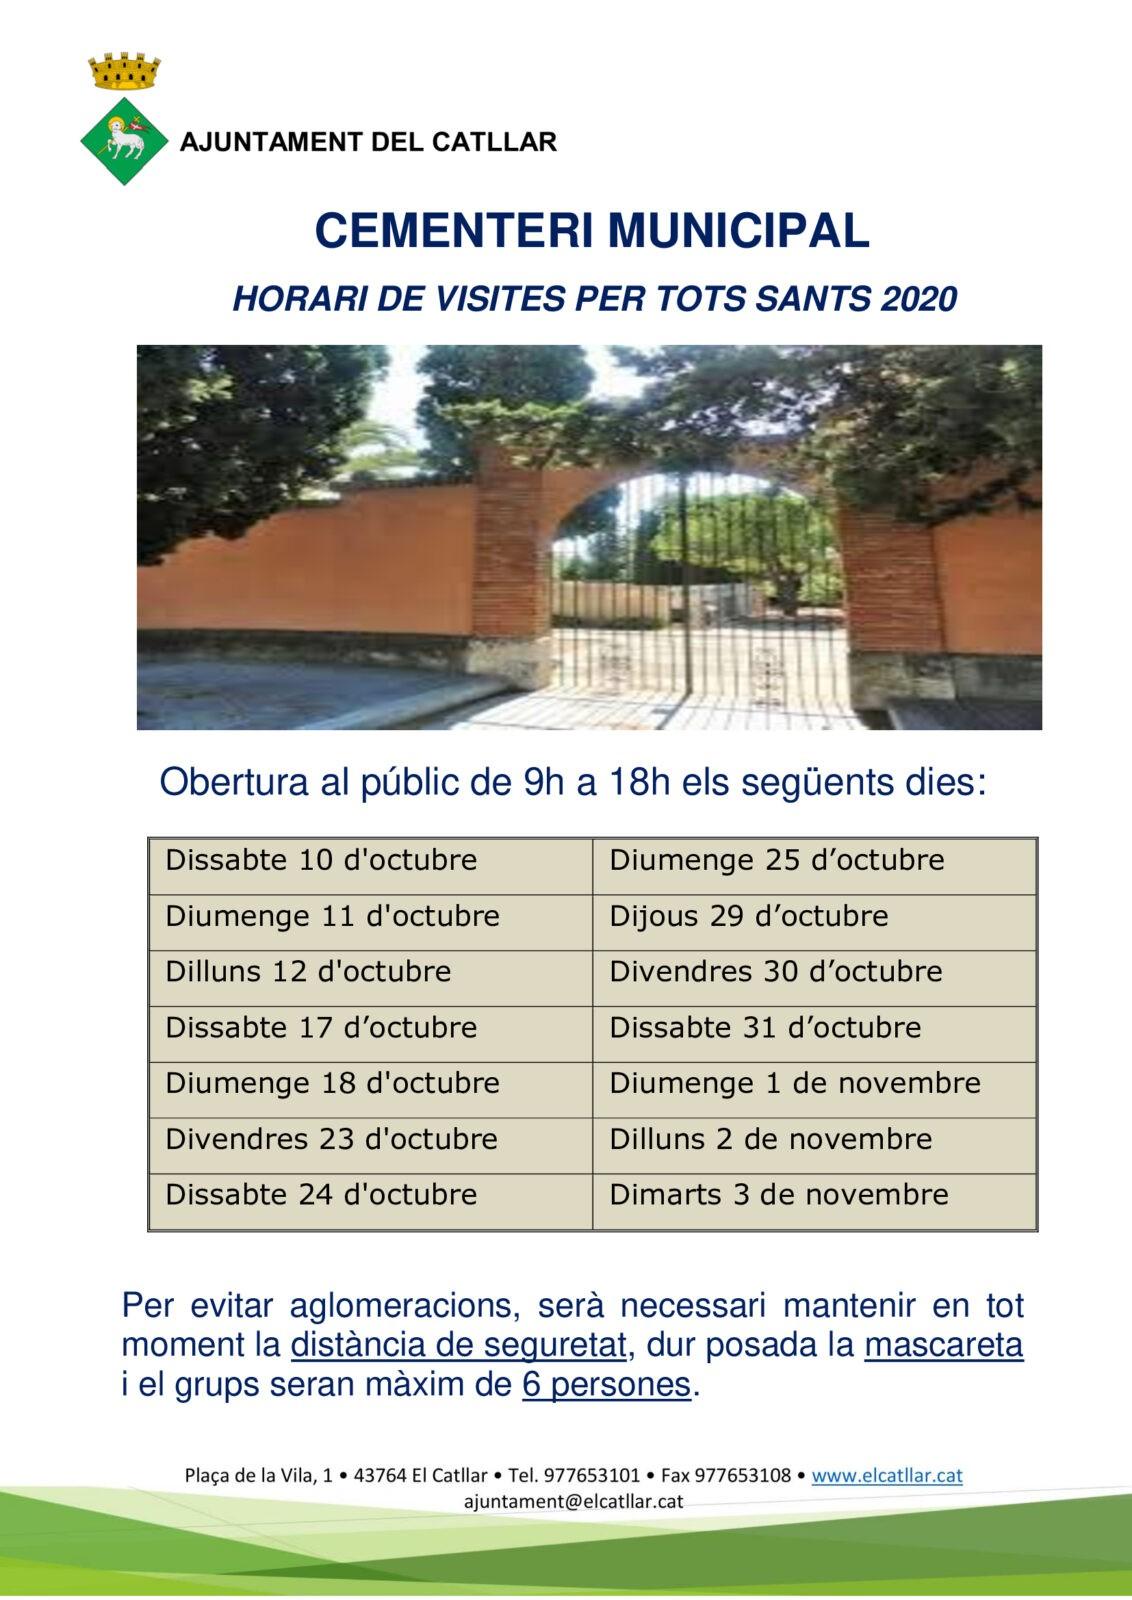 HORARI CEMENTIRI MUNICIPAL PER TOTS SANTS 2020